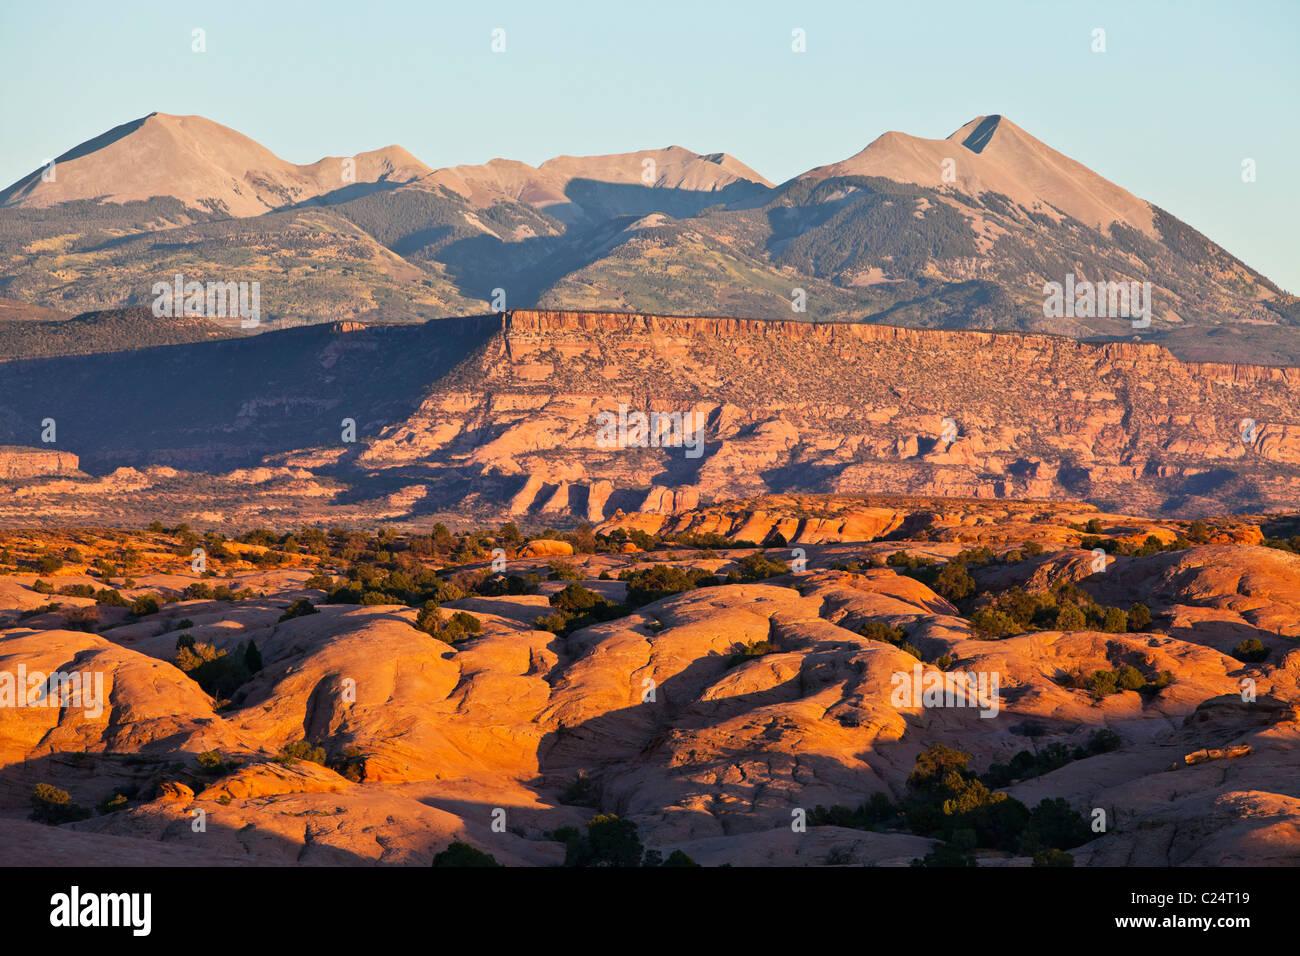 The La Sal Mountain Range as seen from Slickrock trail outside Moab, Utah, USA. - Stock Image